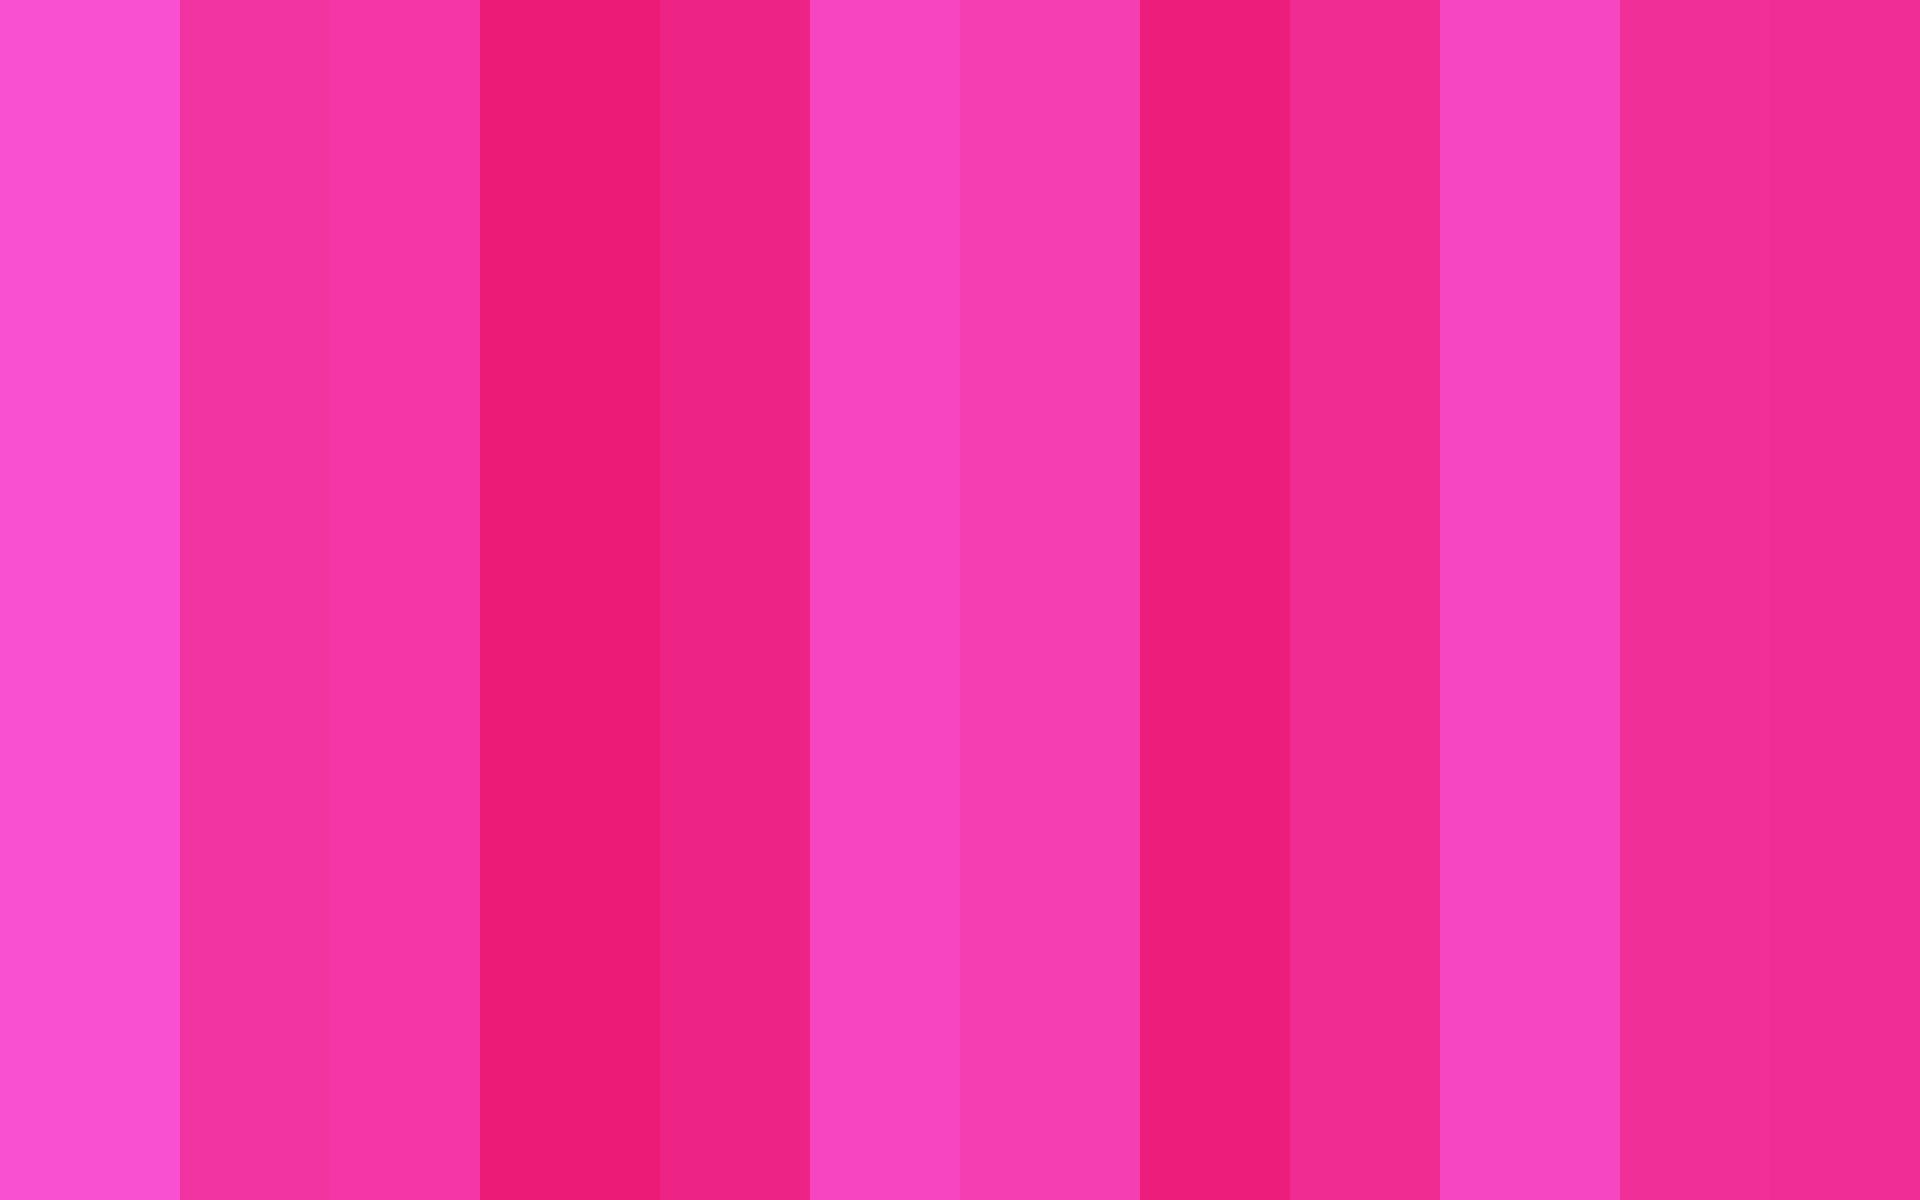 Panda Pink by Positivity 1920x1200